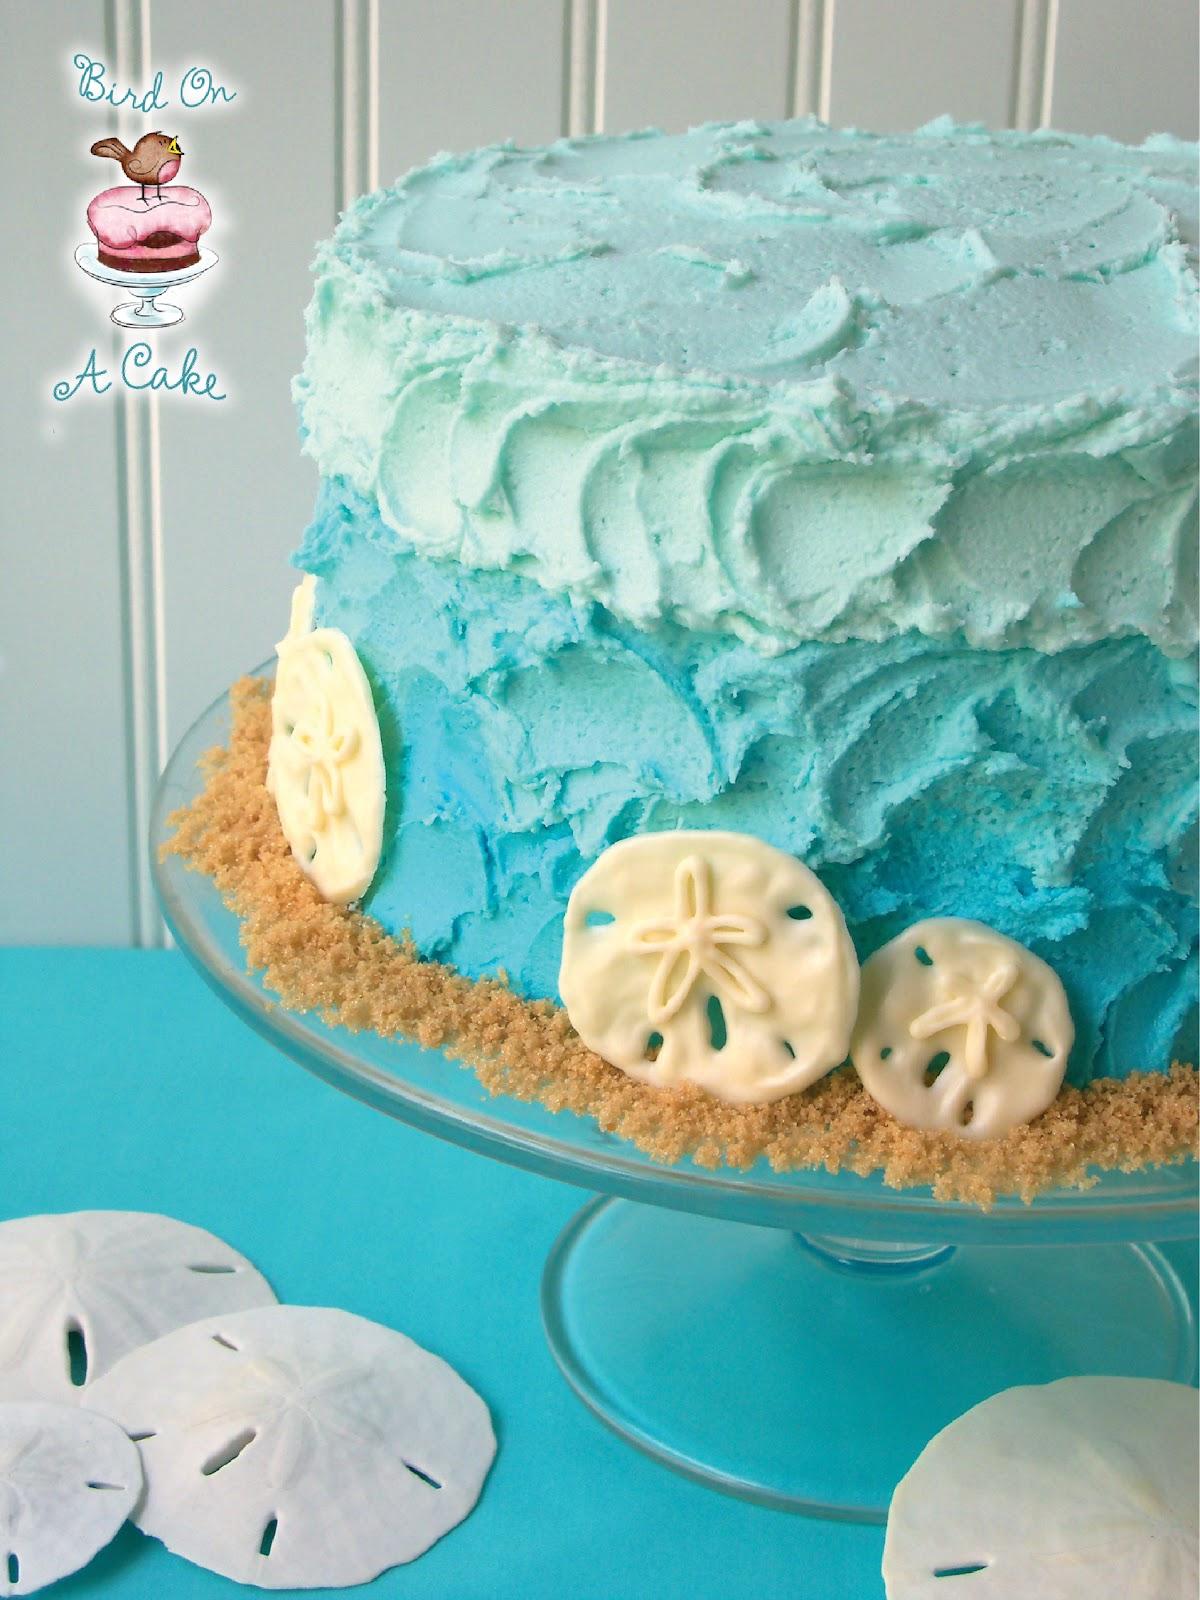 http://birdonacake.blogspot.com/2012/07/ombre-beach-cake-with-chocolate-sand.html